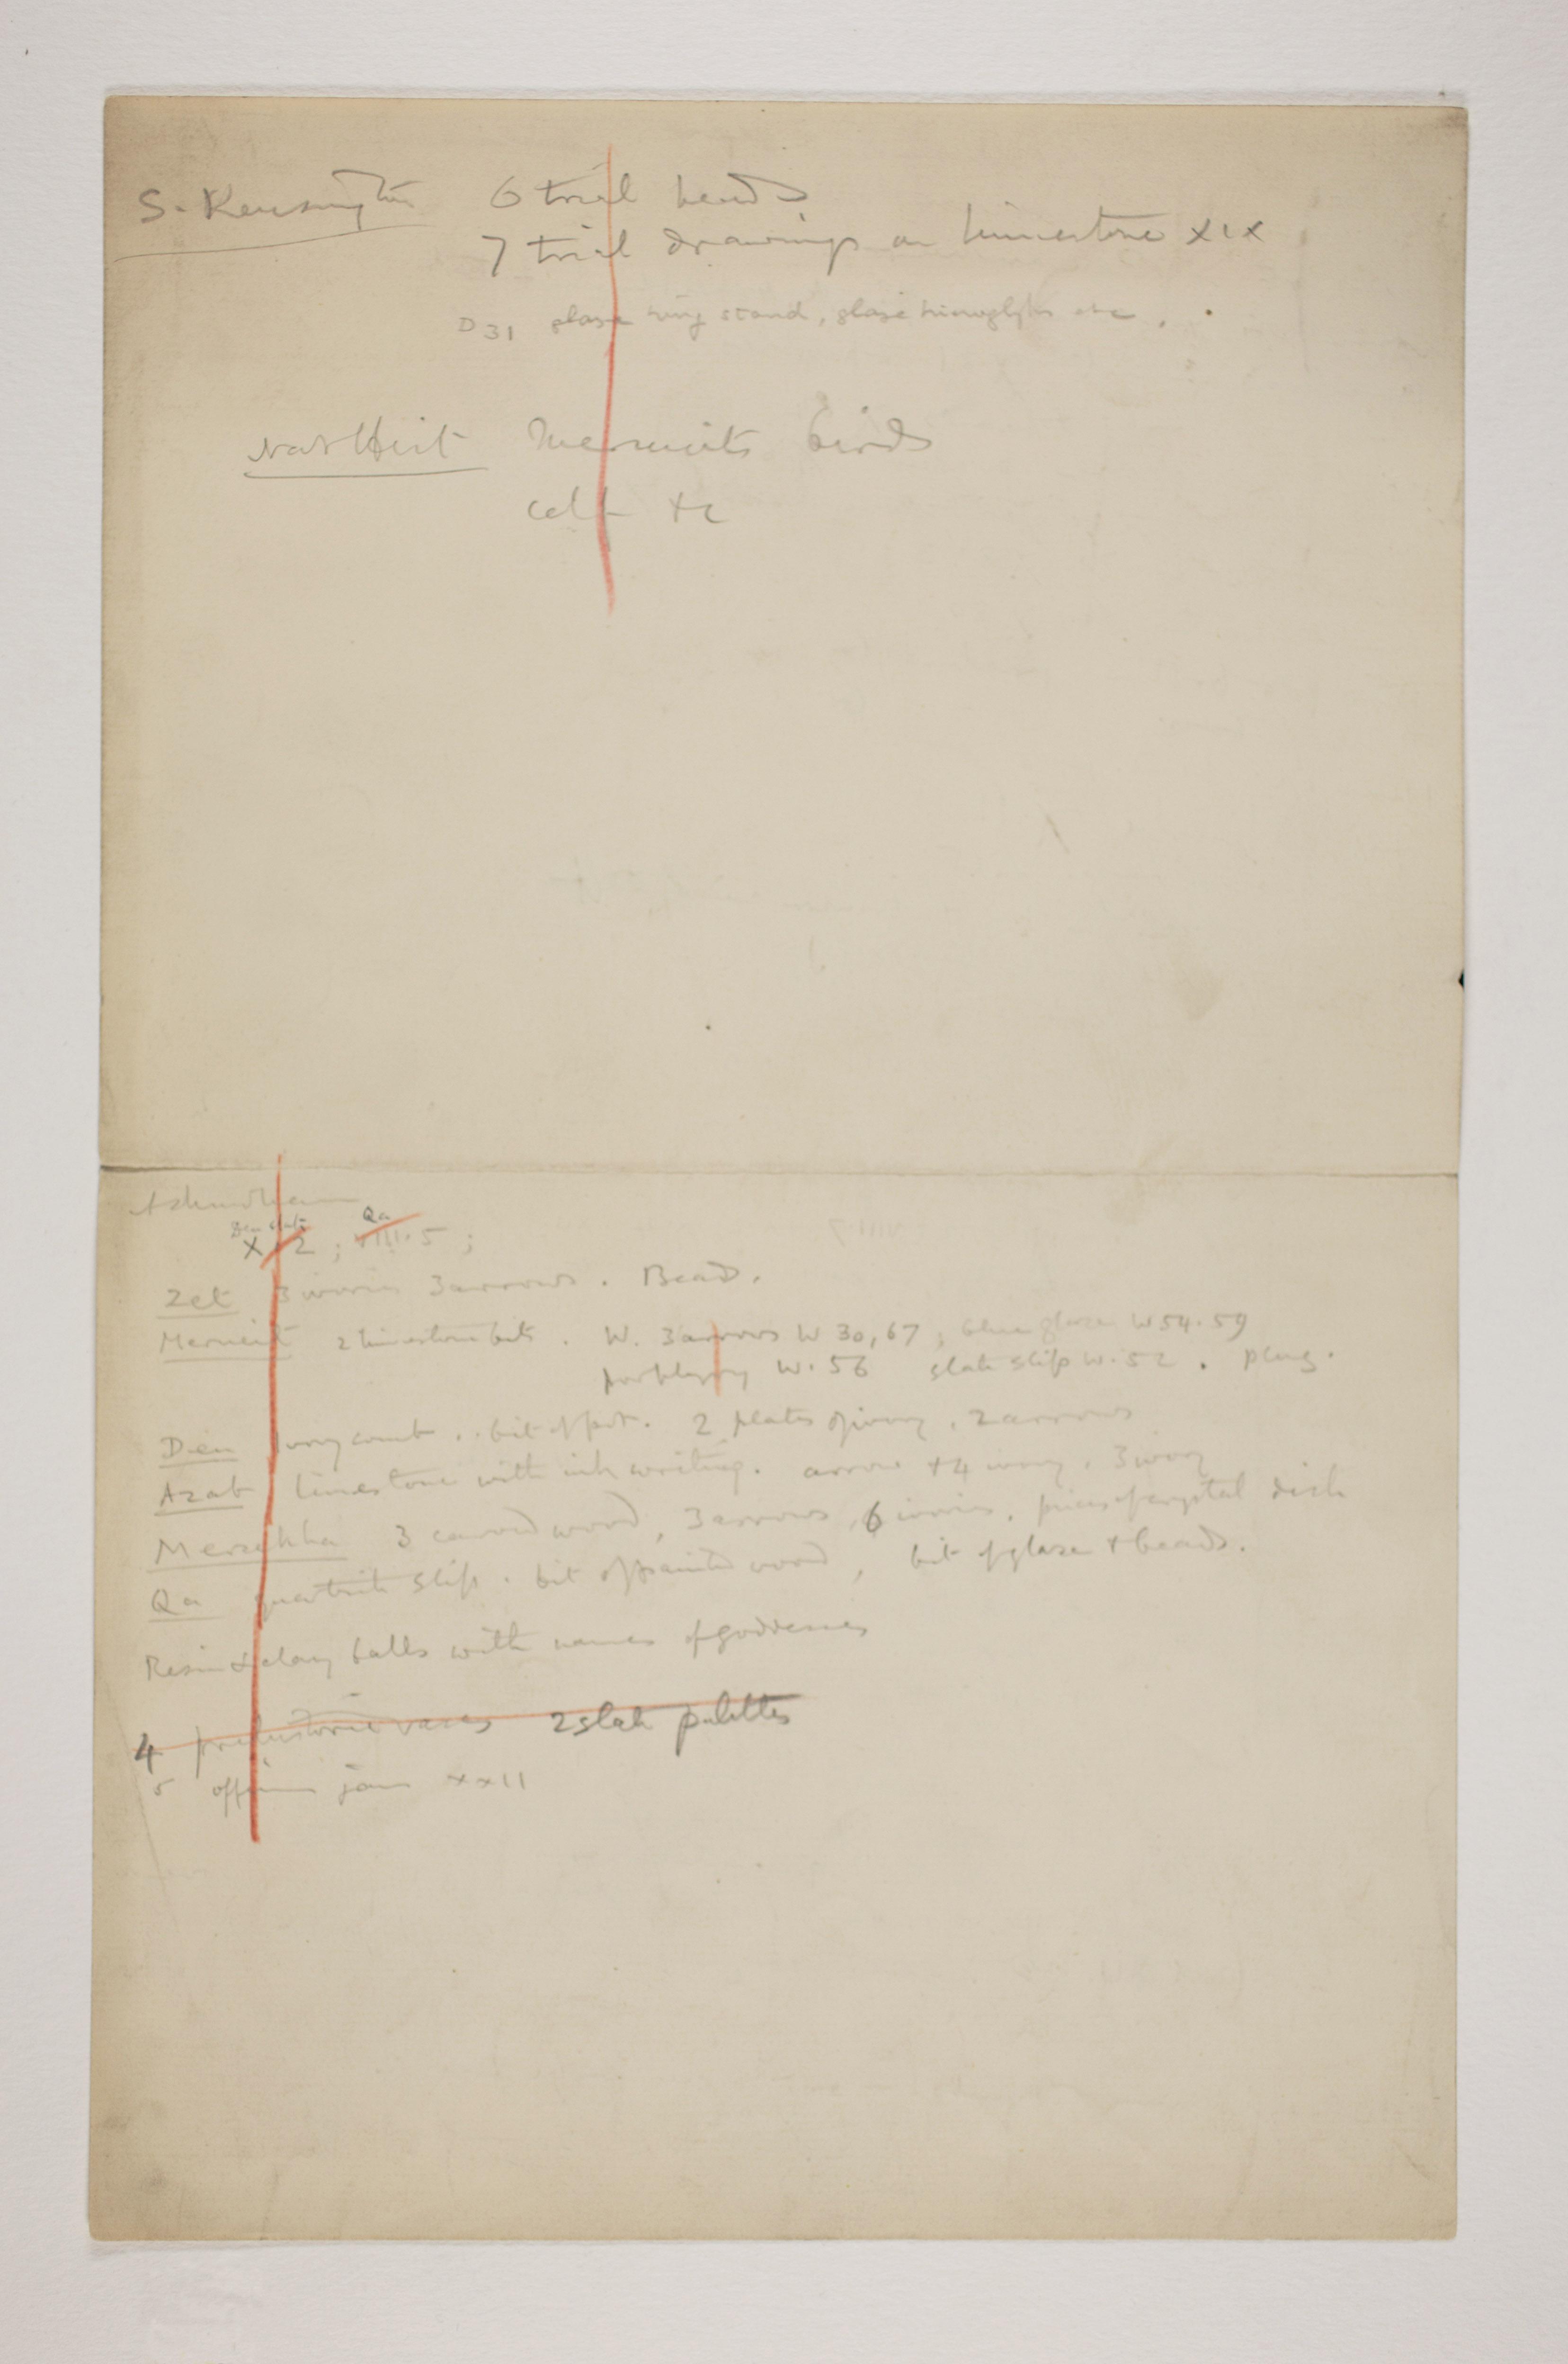 1899-1900 Abydos Multiple institution list PMA/WFP1/D/8/9.2